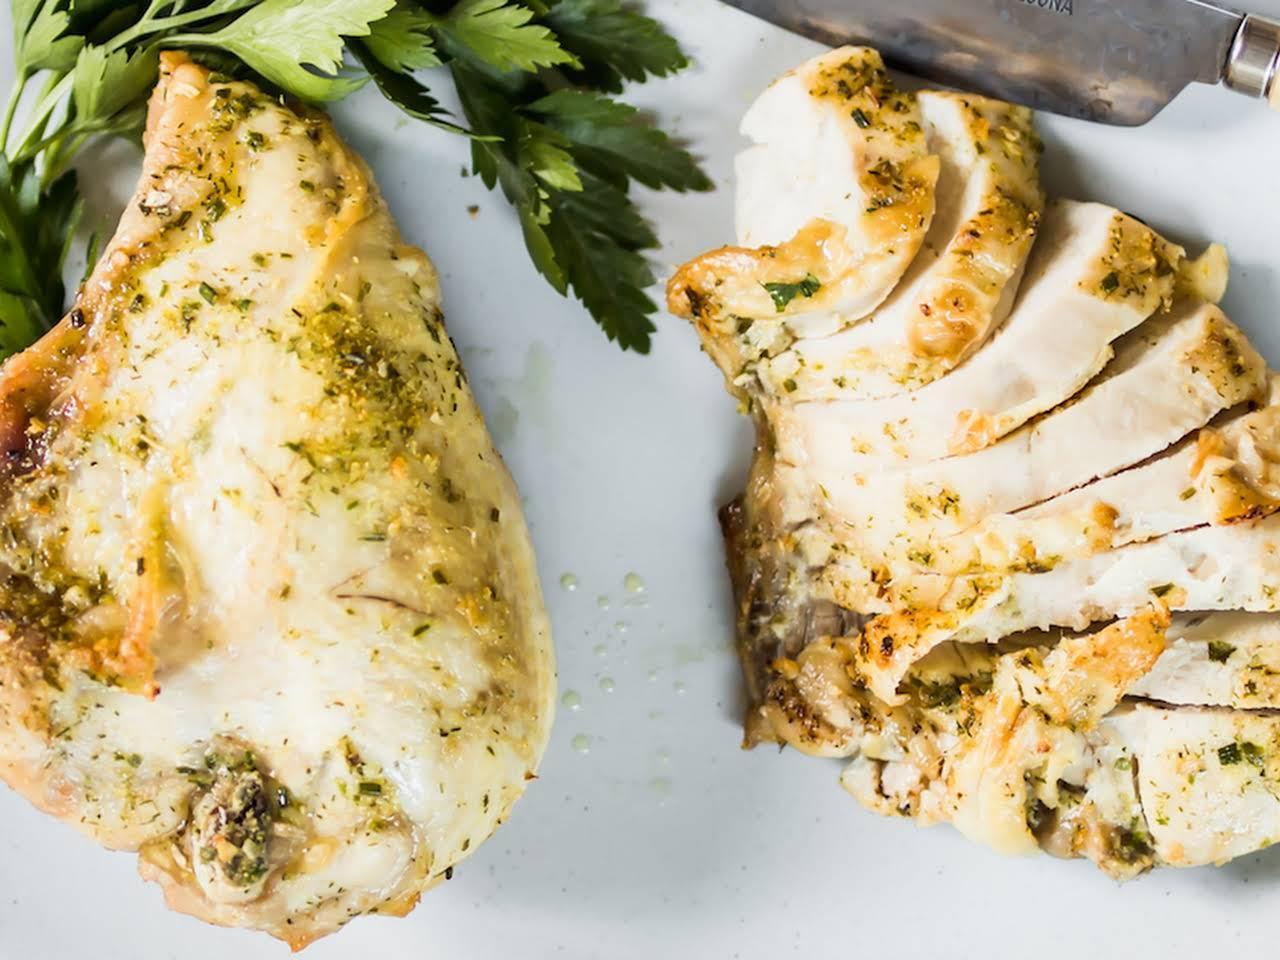 10 Best Baked Chicken Breast No Salt Recipes Yummly